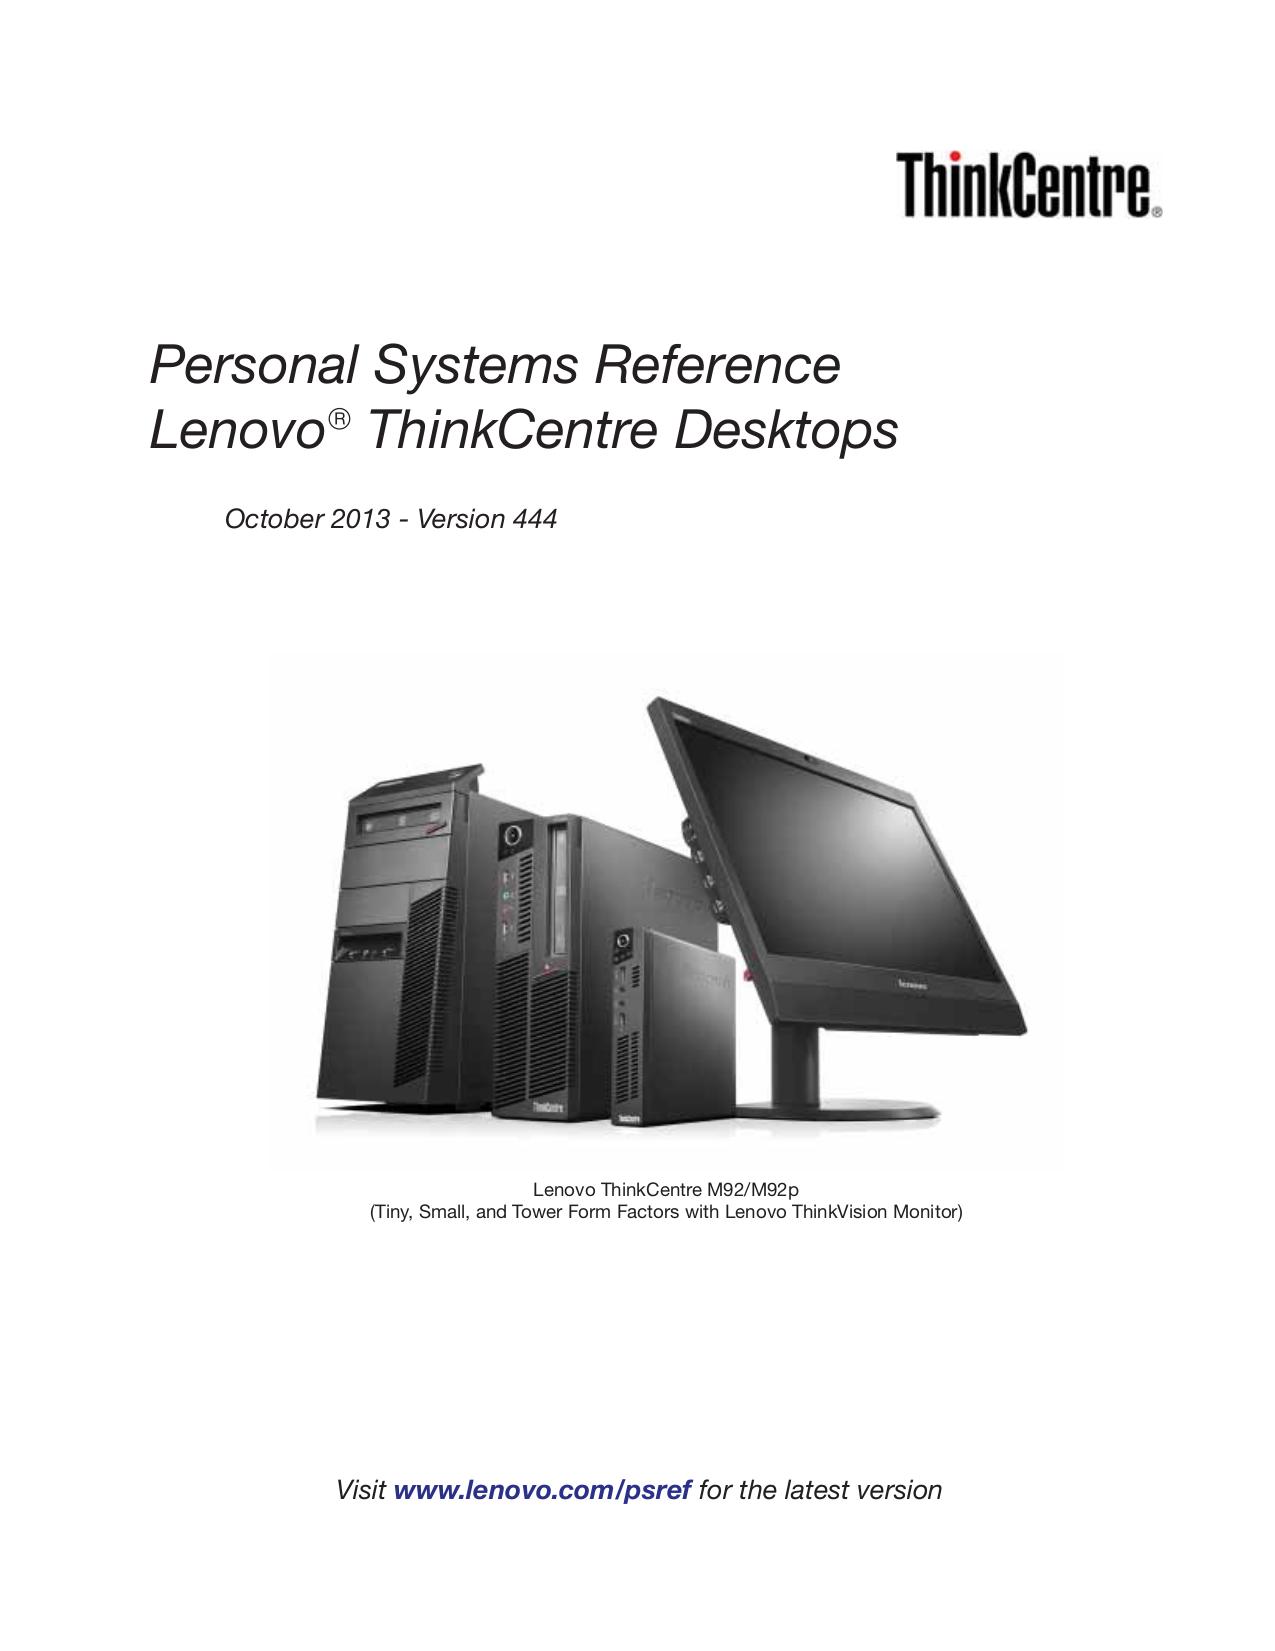 pdf for Lenovo Desktop ThinkCentre M71e 3133 manual